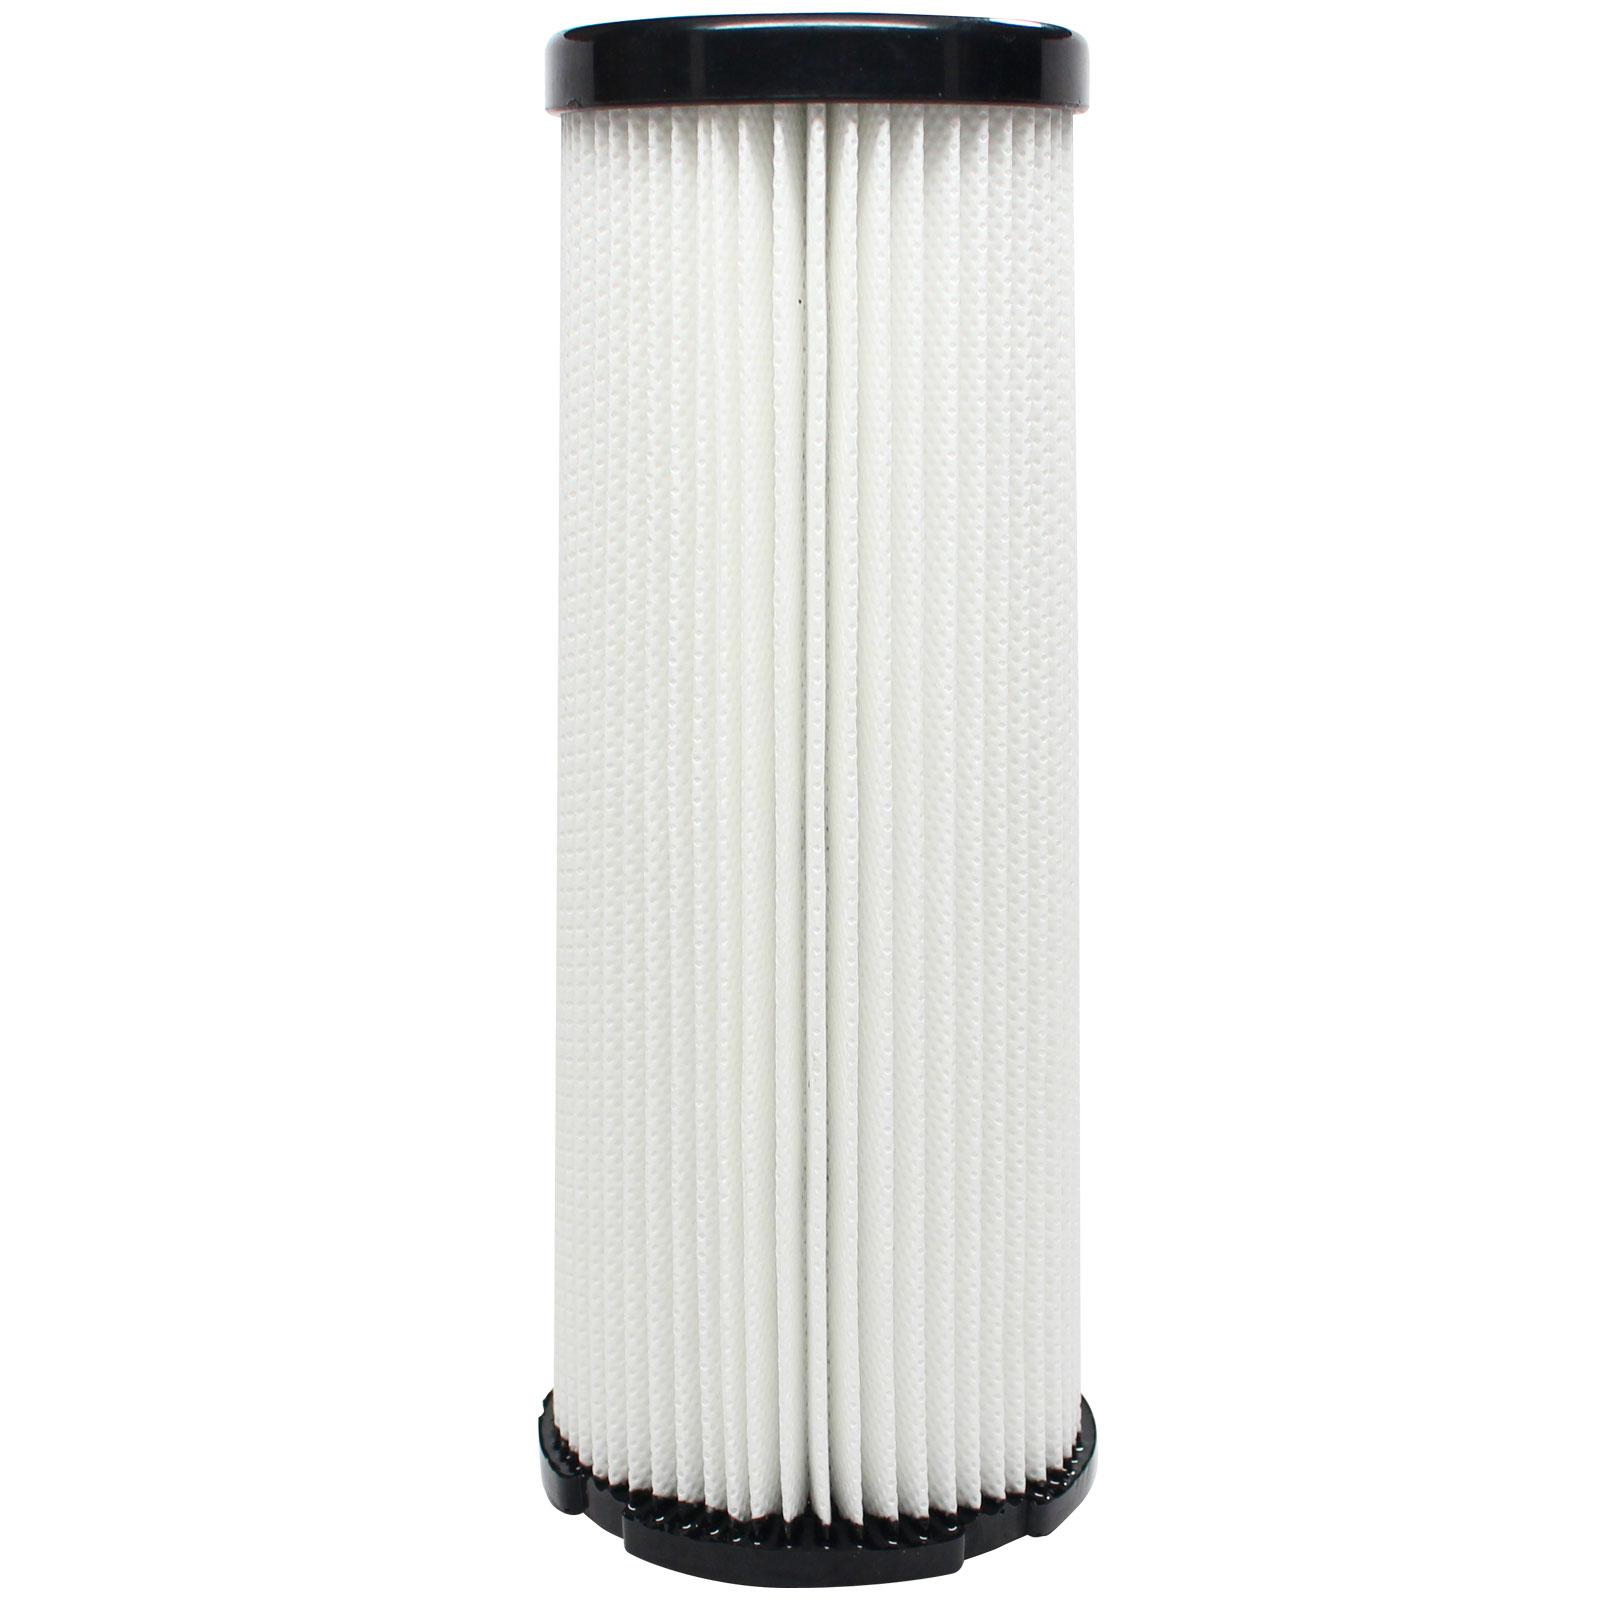 3x Vacuum Filter for Dirt Devil 085805,087800,088400,M085845,086700